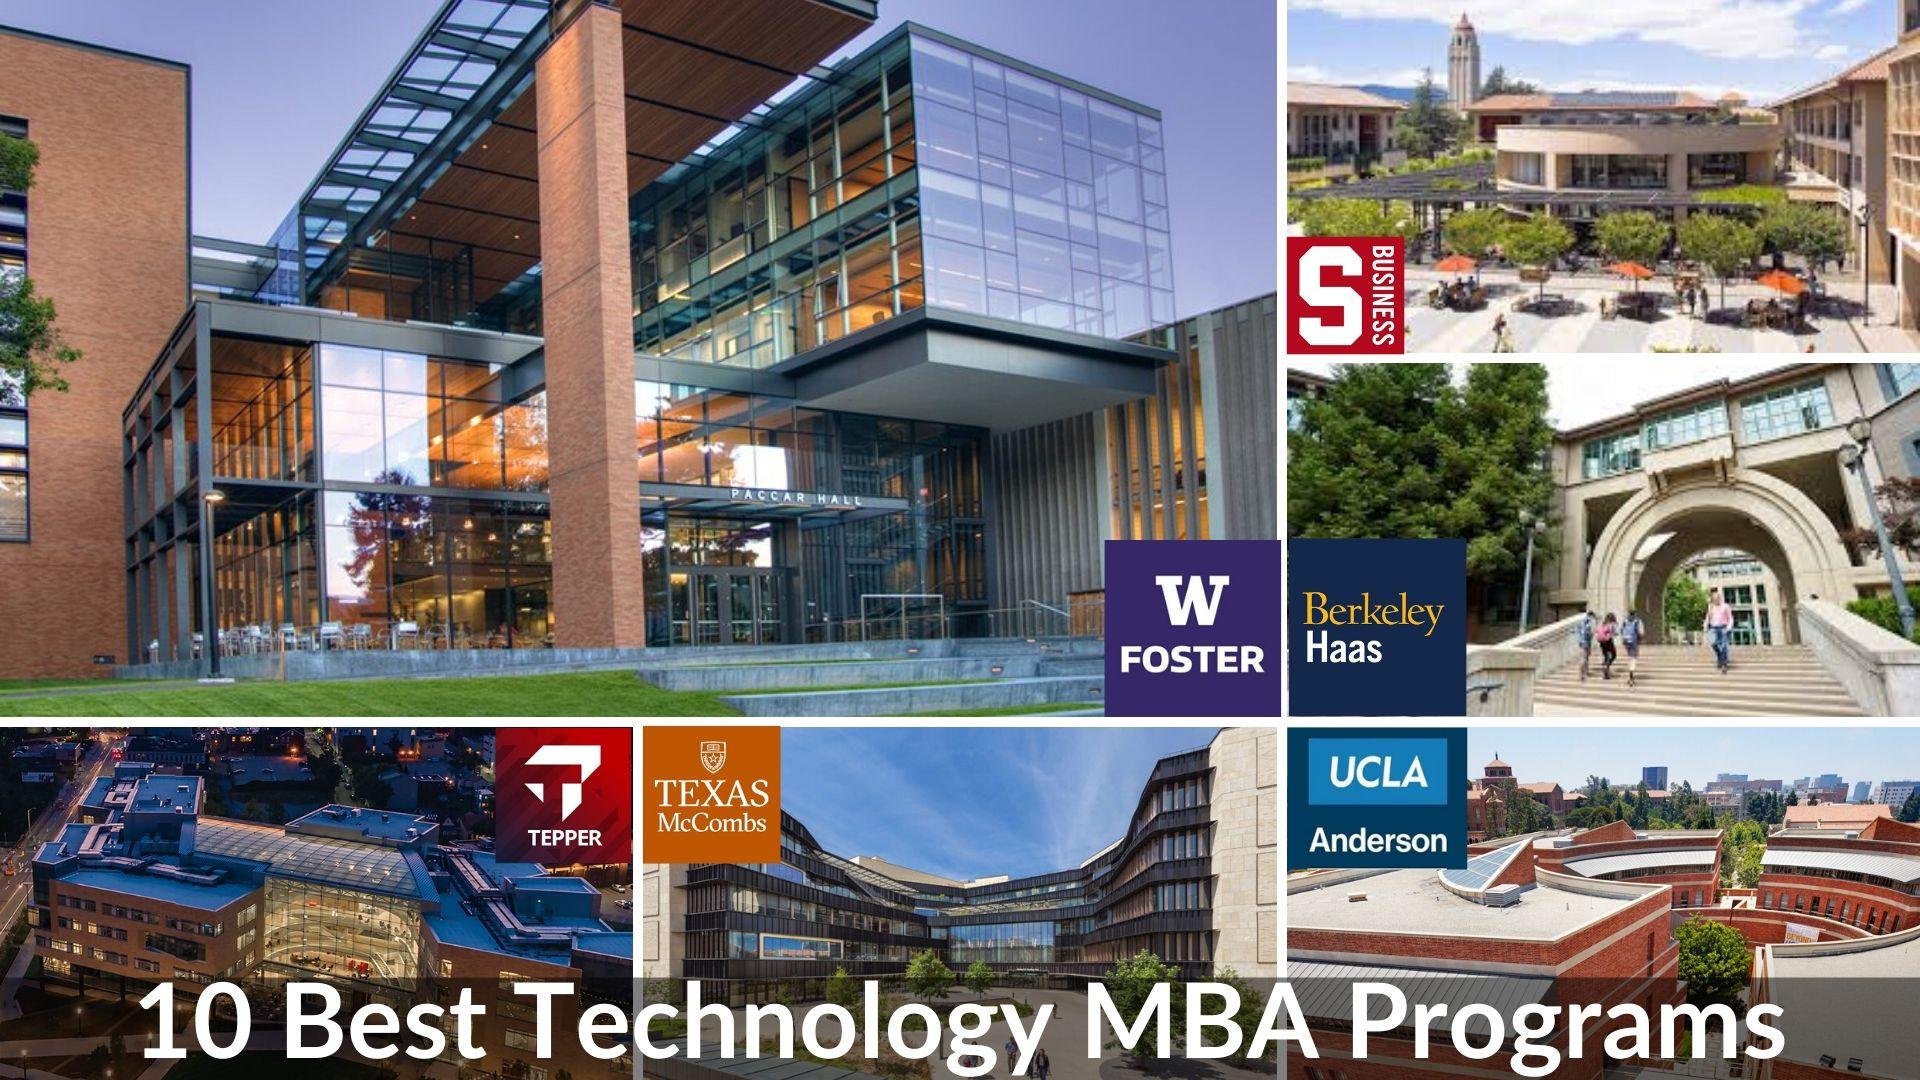 10 Best Technology MBA Programs